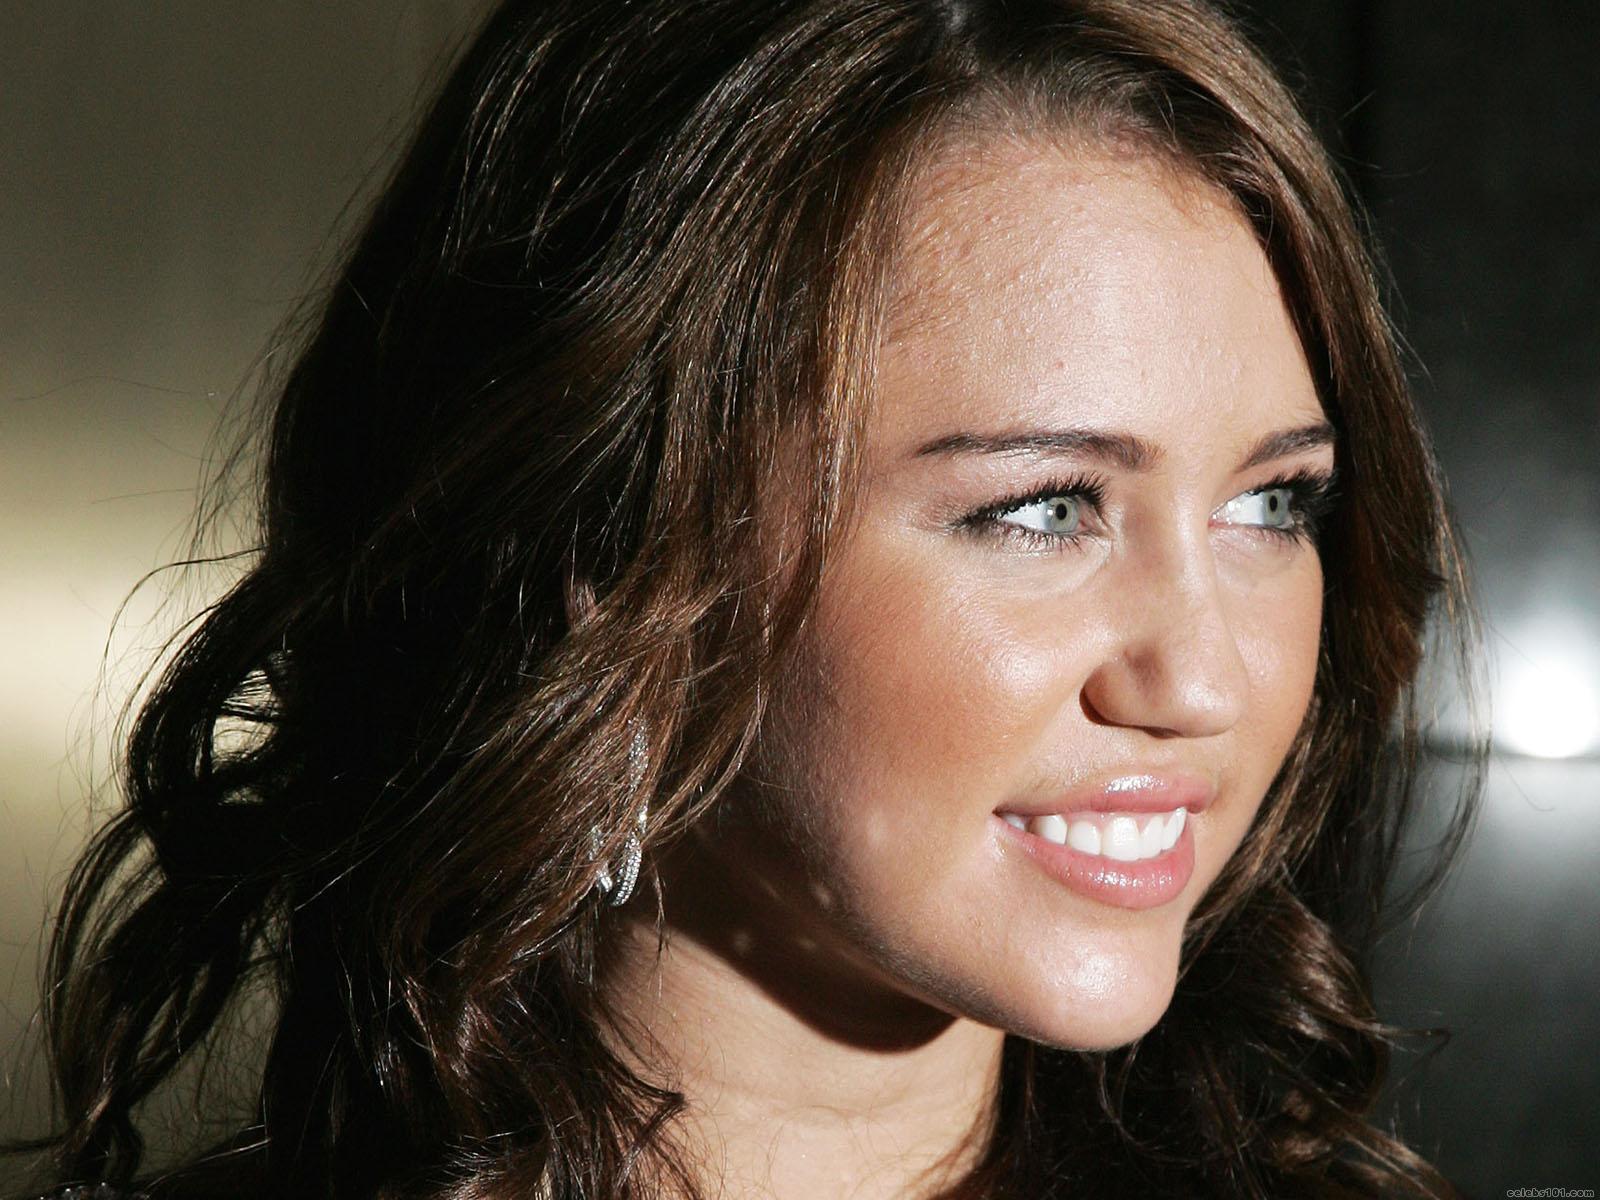 http://www.celebs101.com/wallpapers/Miley_Cyrus/221192/Miley_Cyrus_Hannah_Montana_Wallpaper.jpg